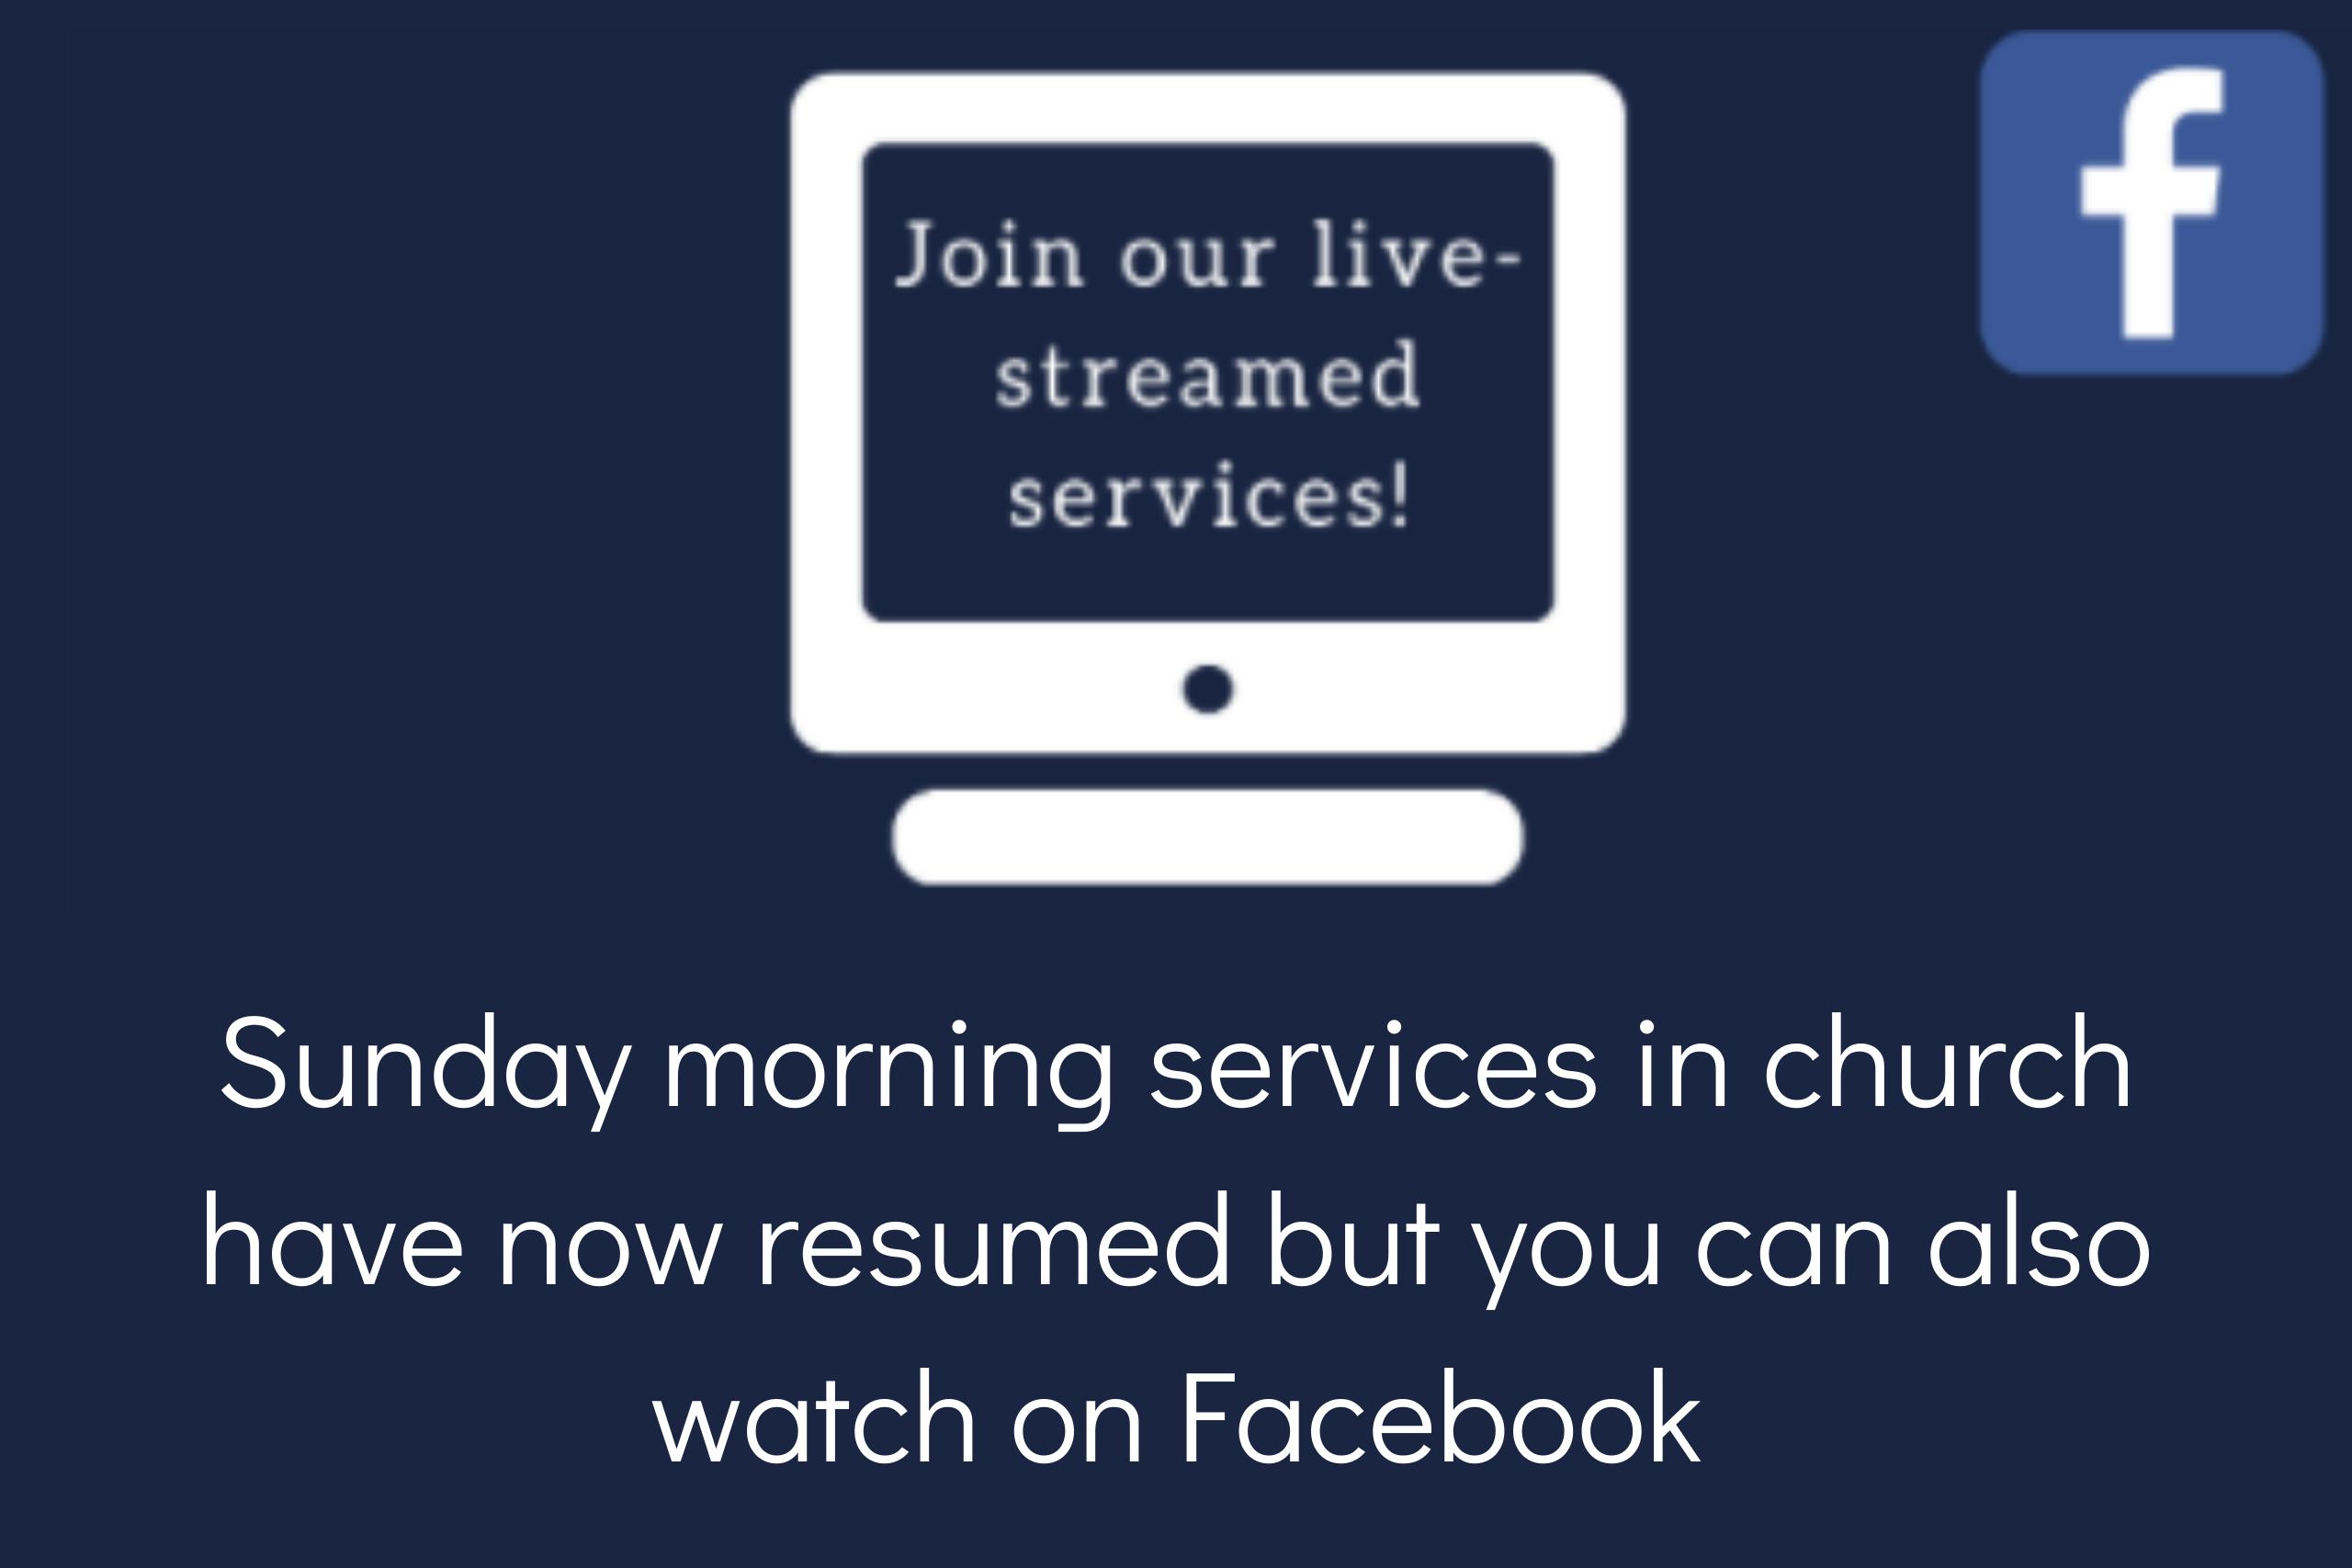 Watch on Facebook